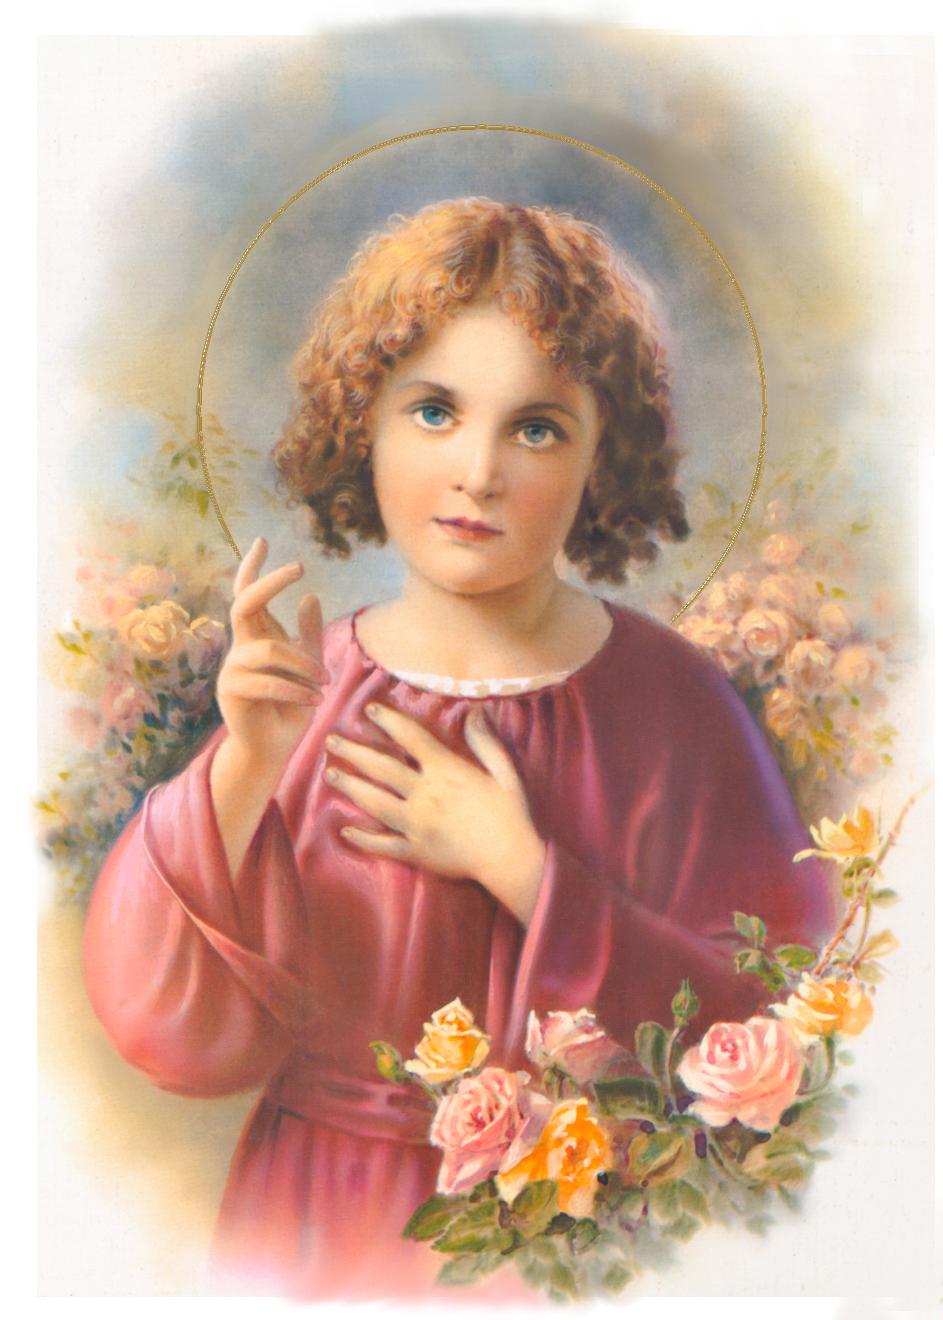 christ memorial child care center